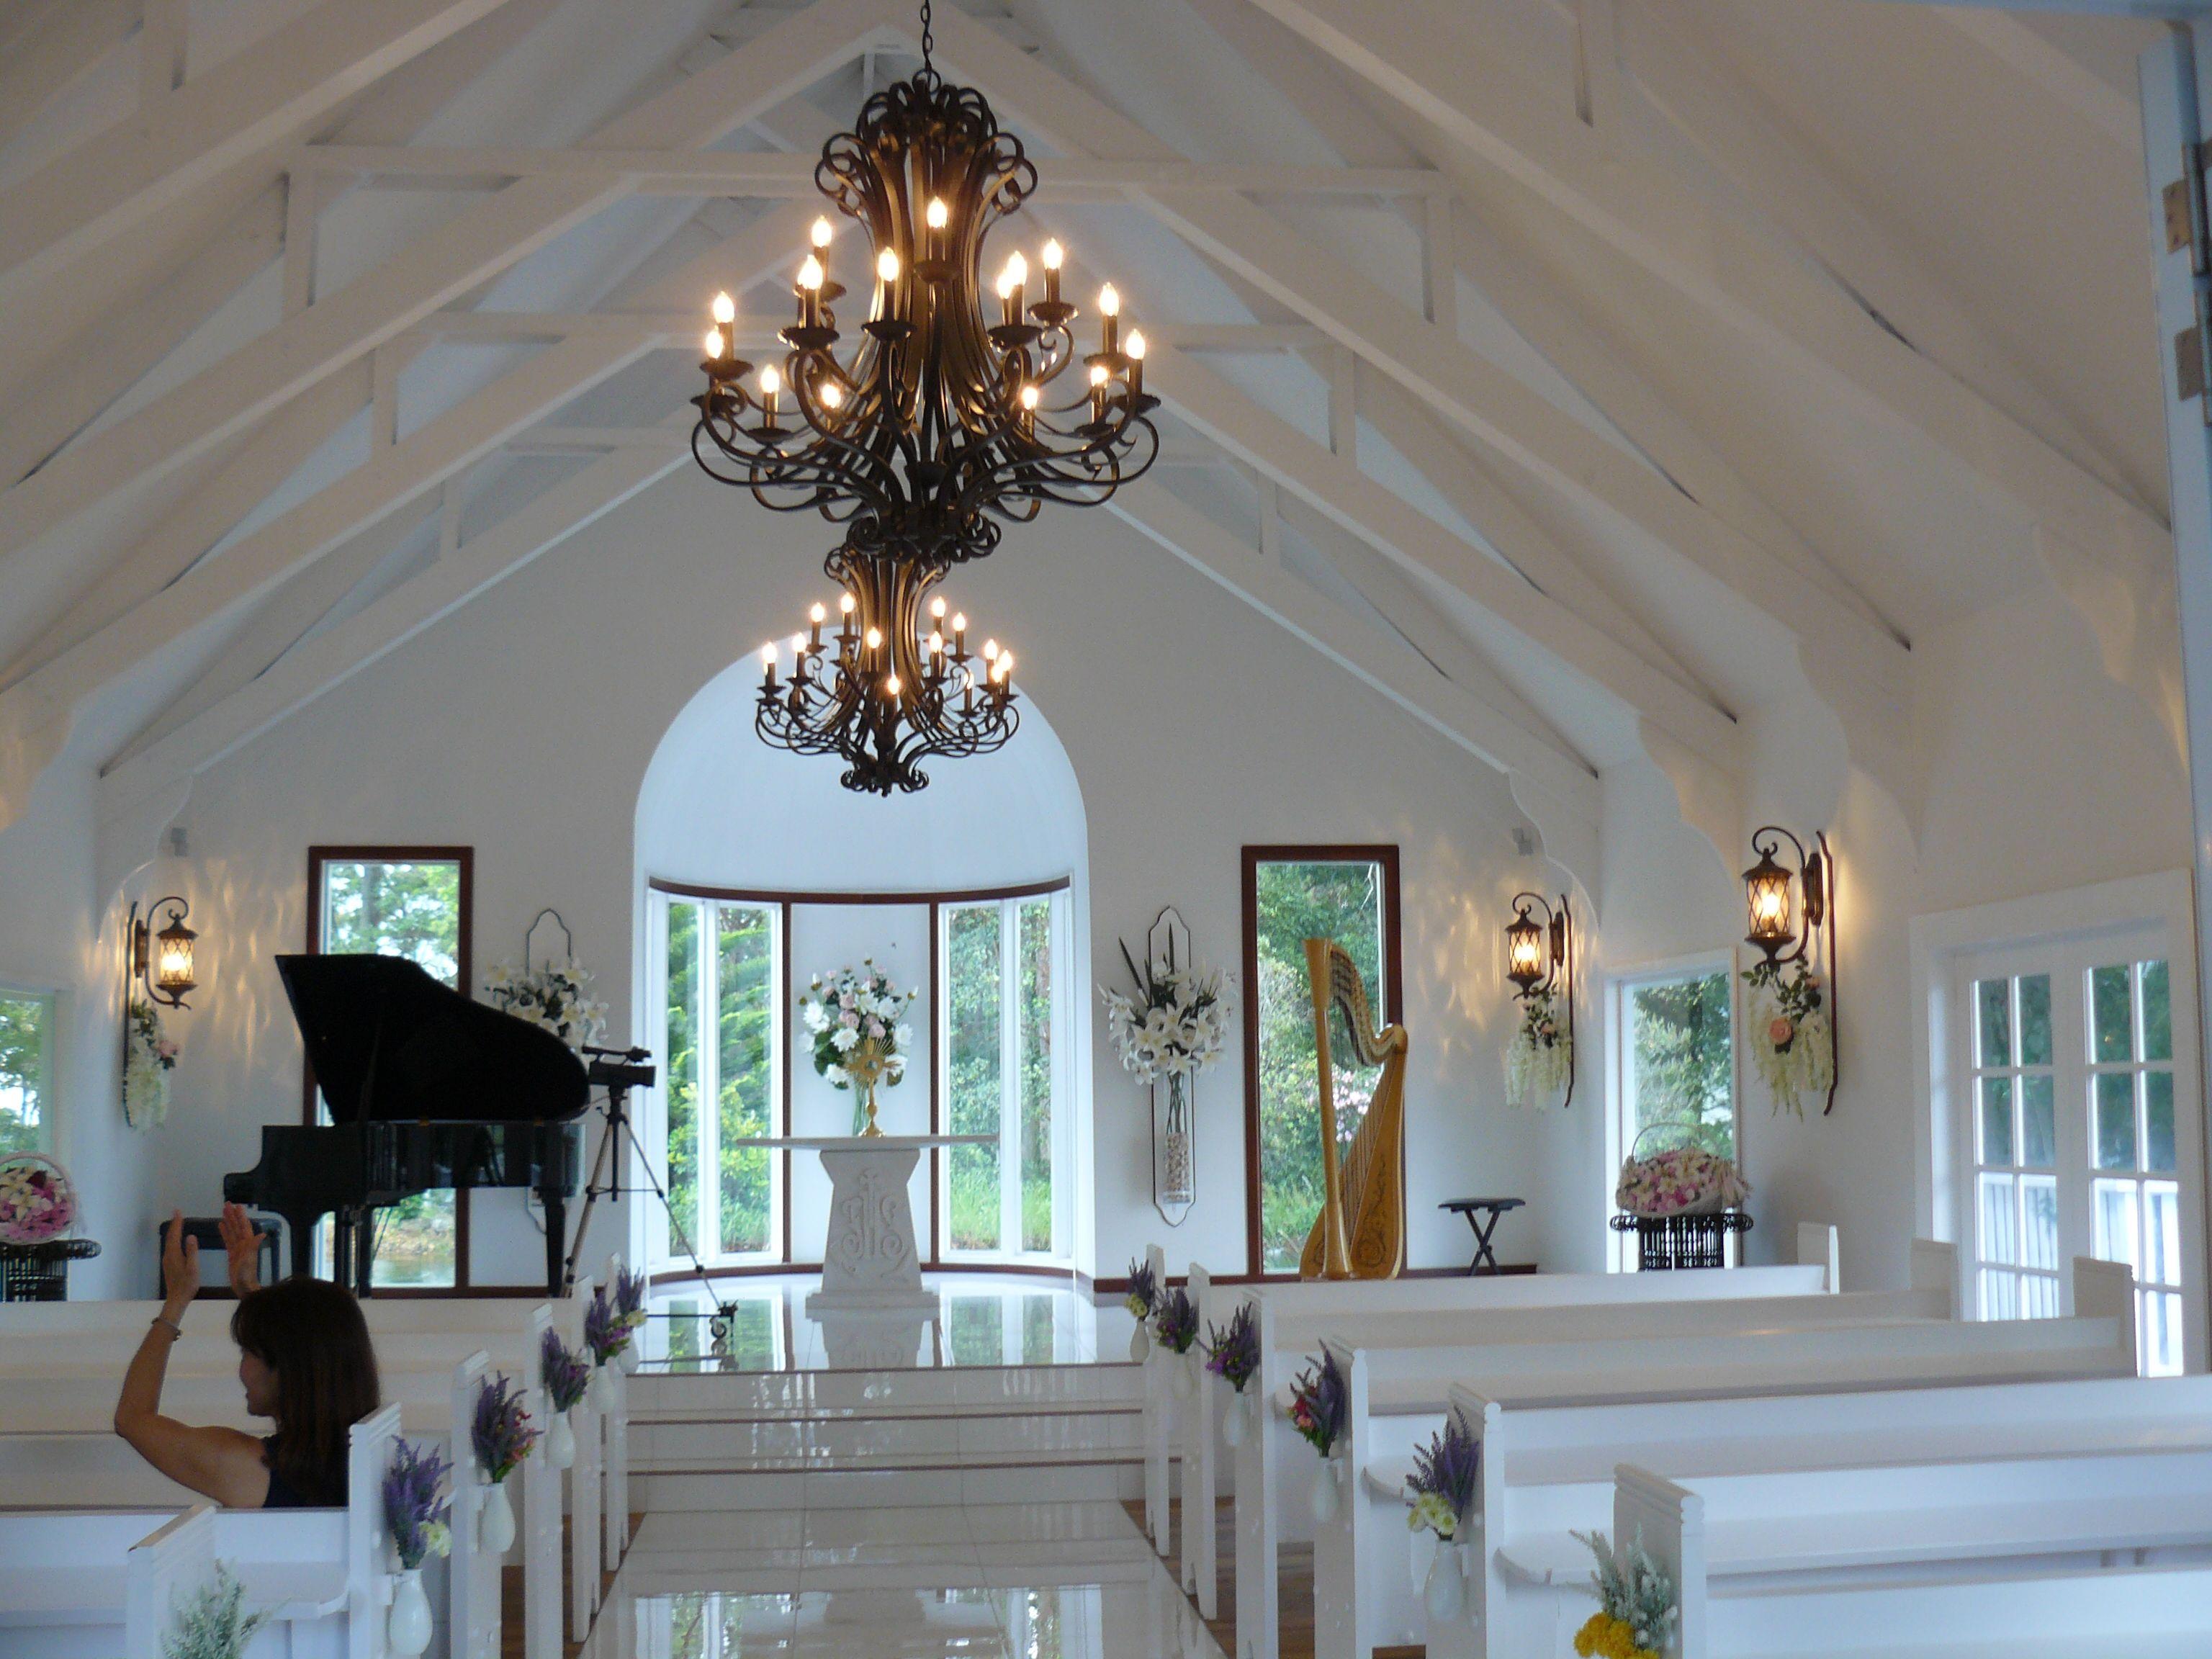 Bavarian Wedding Chapel Brisbane Celebrant Neal Foster The Marriage Performs Weddings